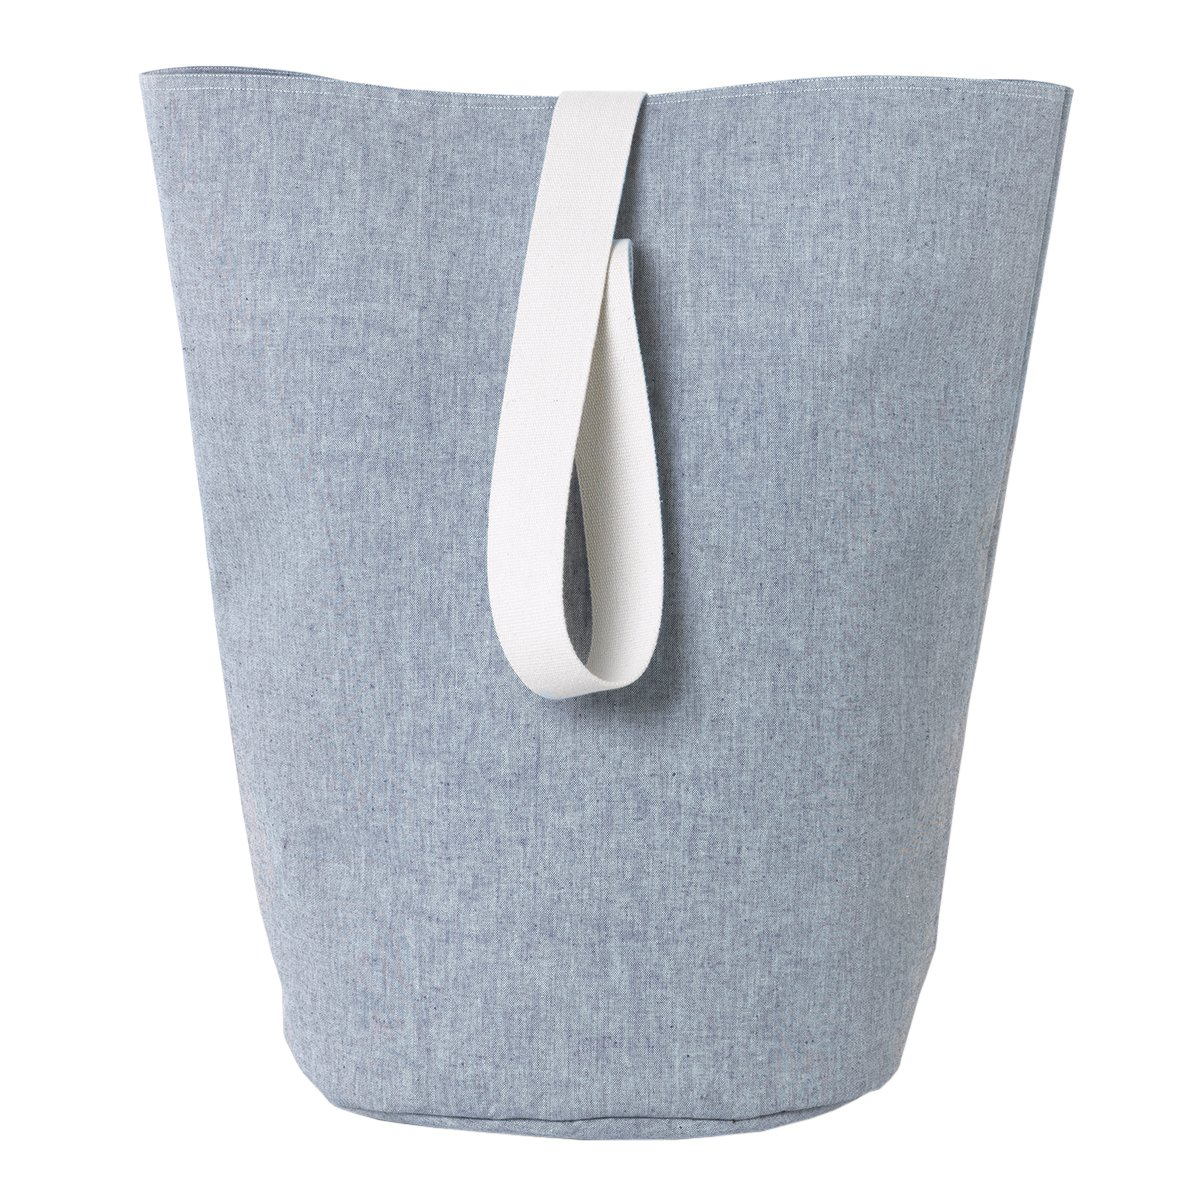 Ferm Living Chambray Basket - Blue - Large